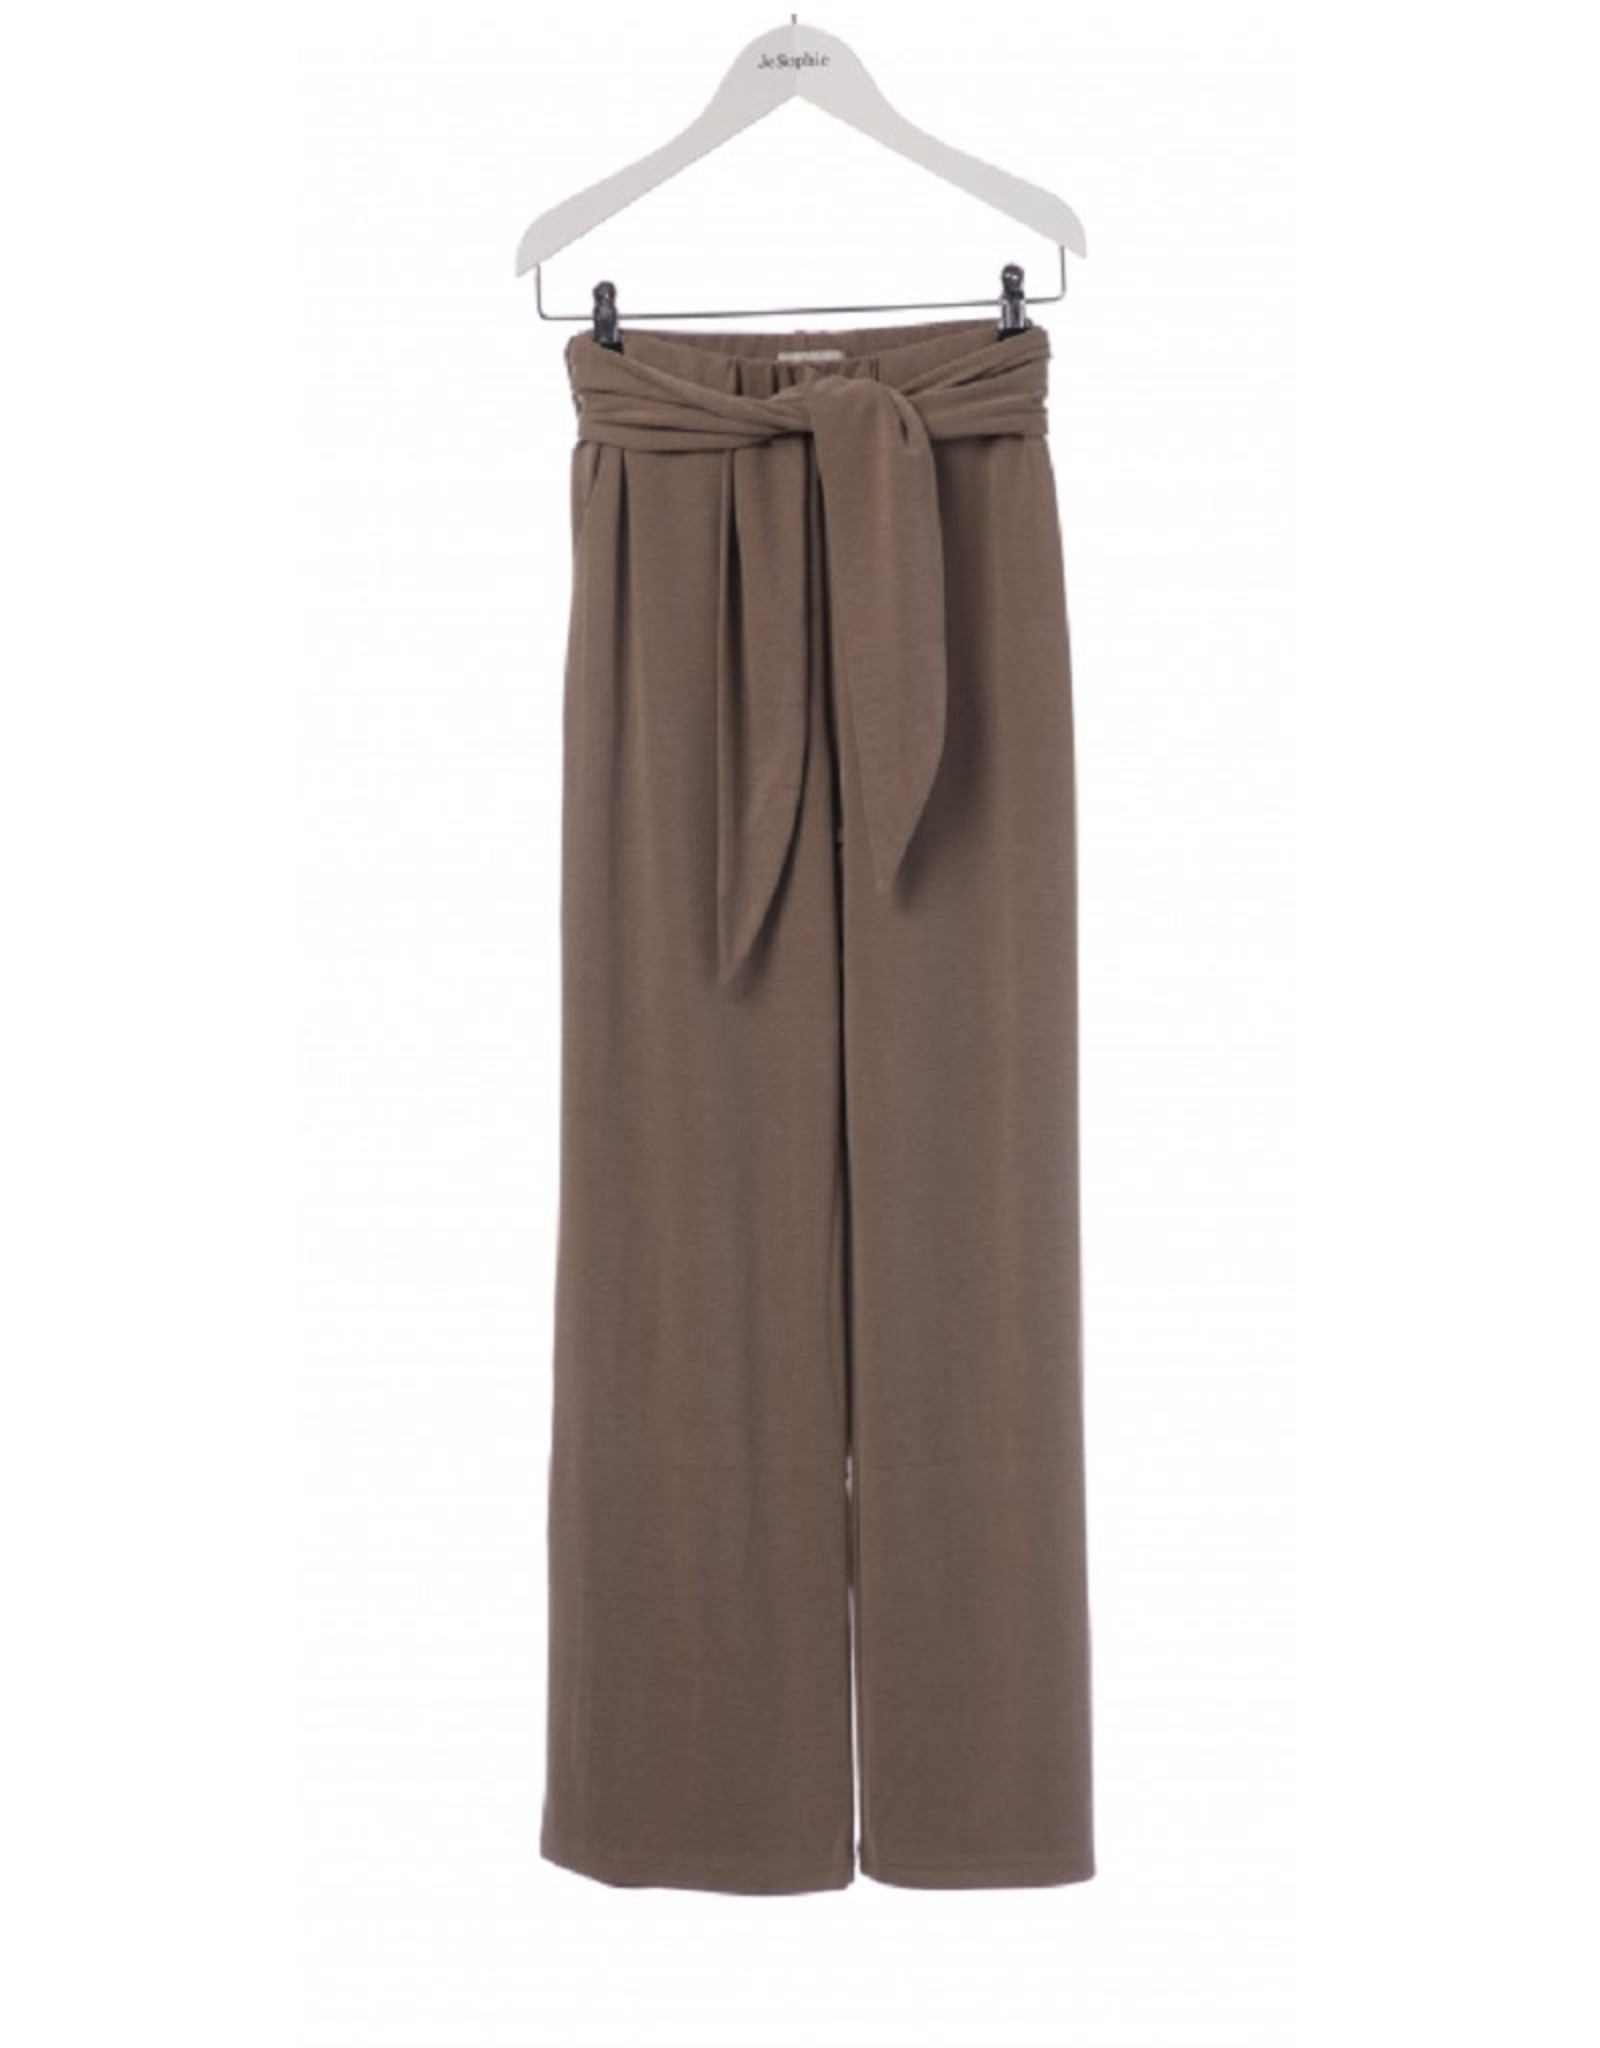 JcSophie JcSophie Gustava trousers Brown